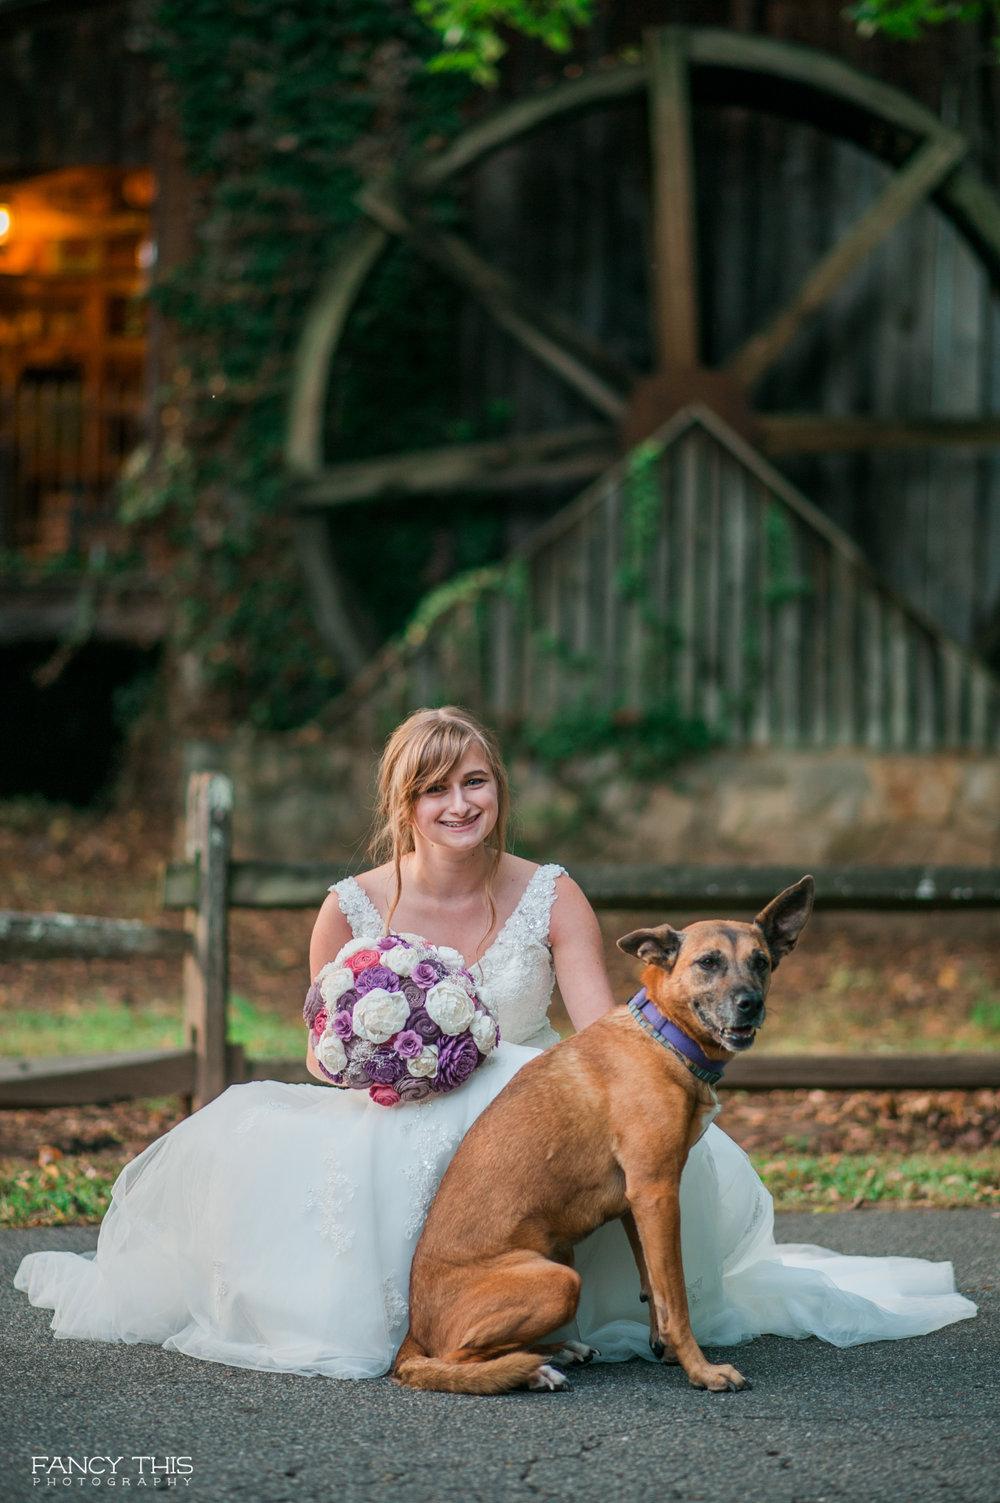 carolsimchik_bridals_socialmediaready-43.jpg